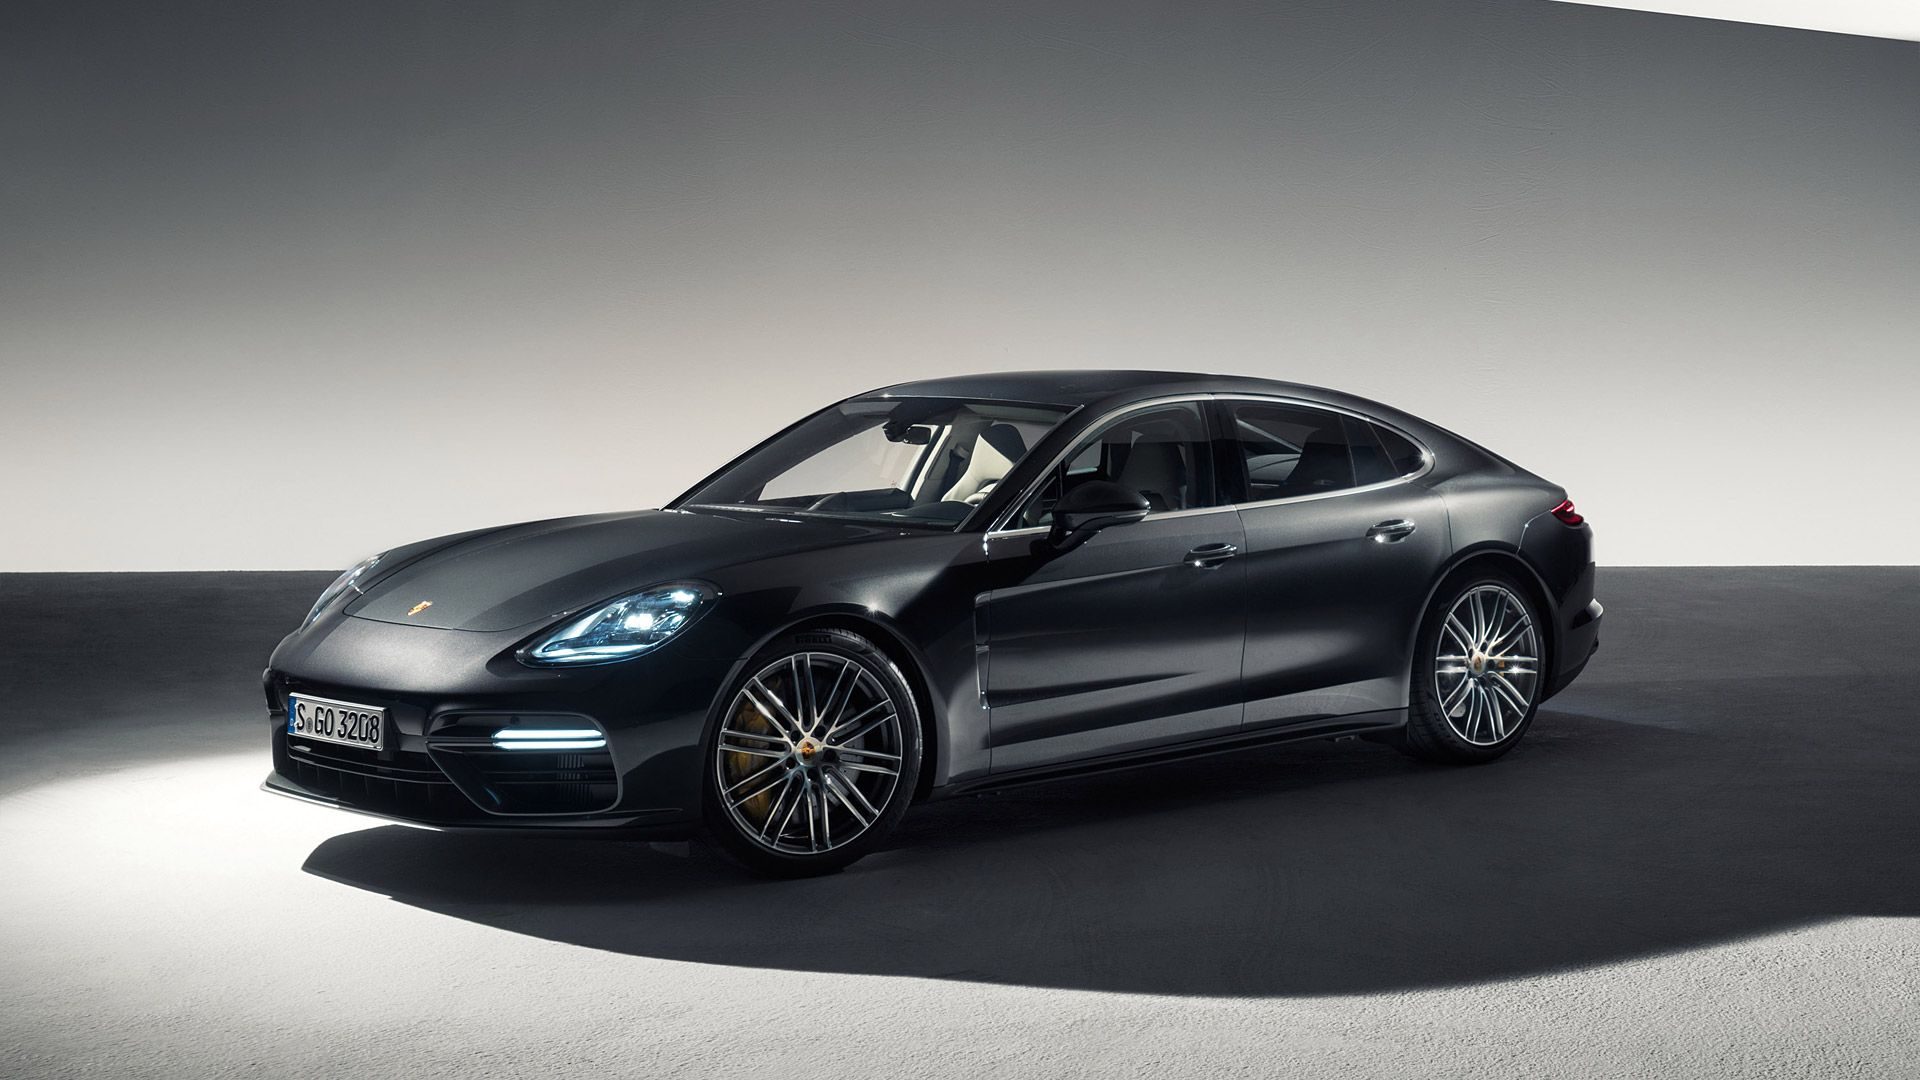 Porsche Panamera Wallpapers Top Free Porsche Panamera